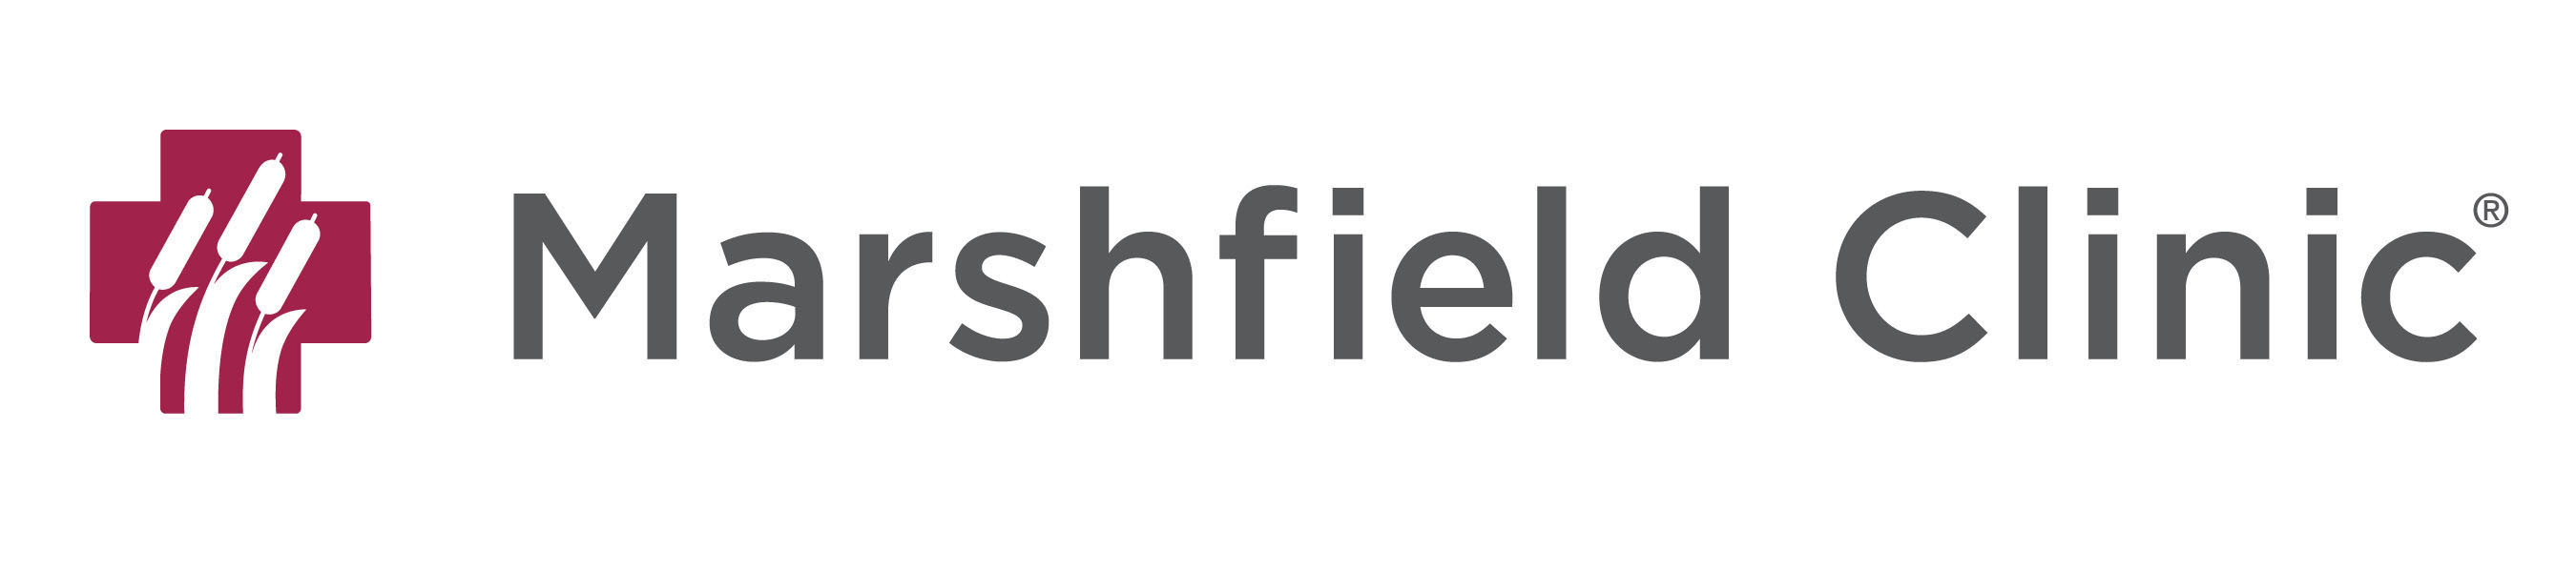 Marshfield Logo.